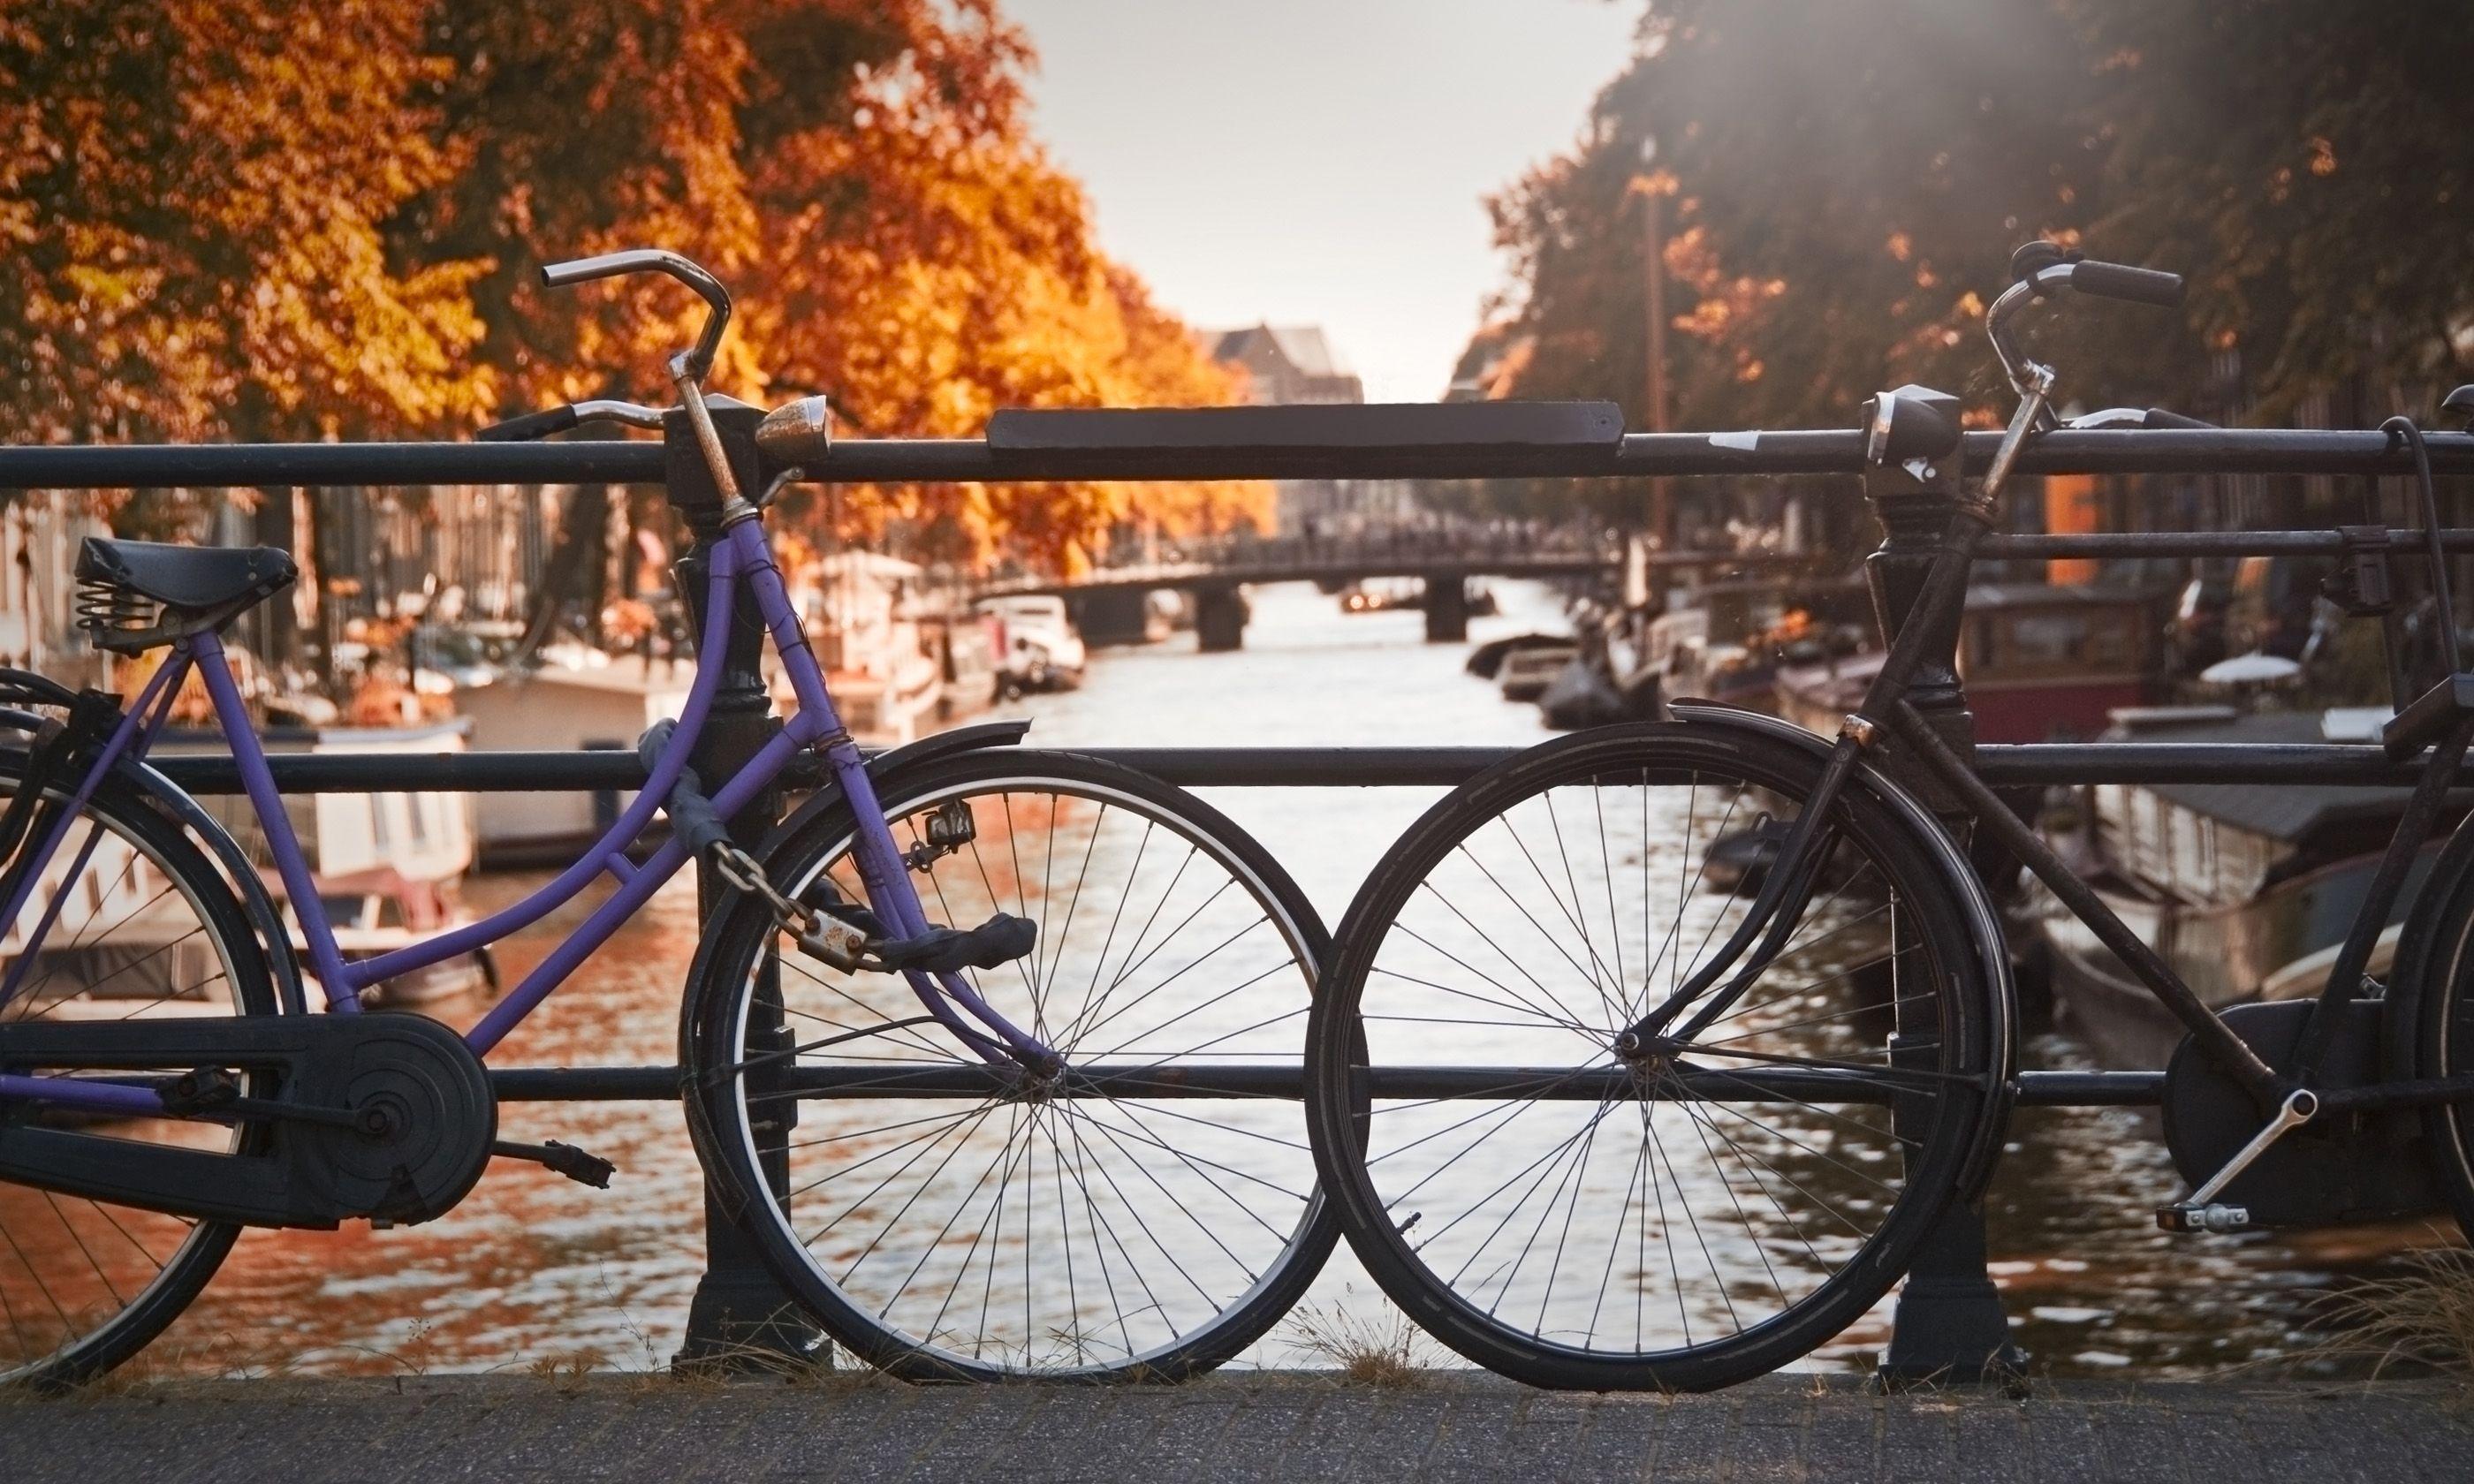 Bikes on a bridge, Amsterdam (Shutterstock.com)